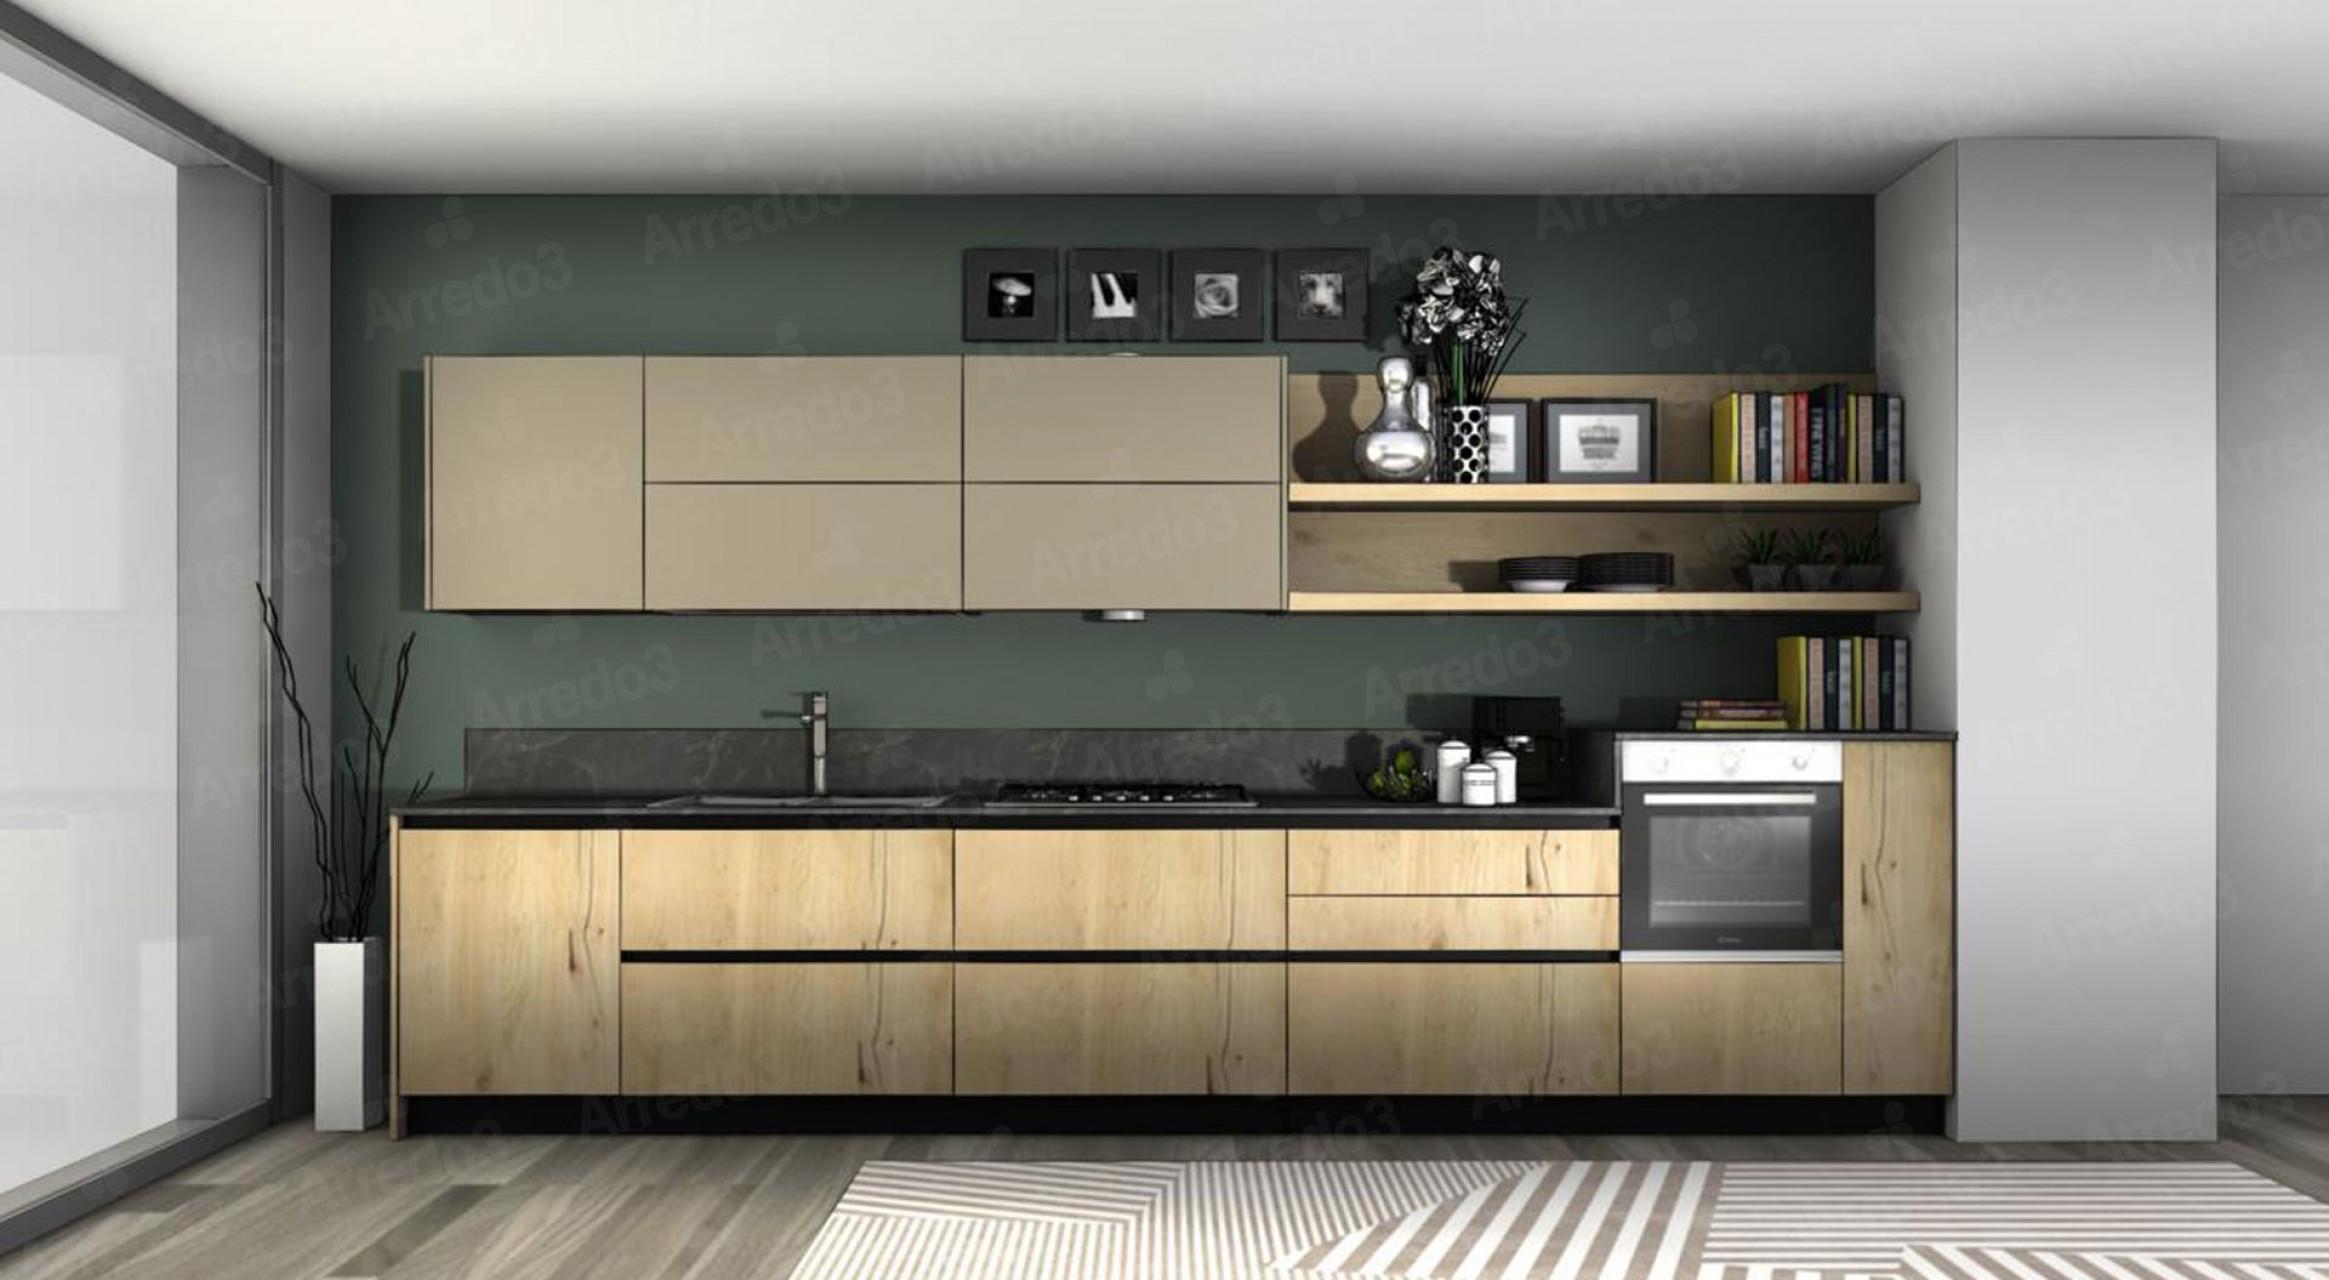 Итальянская Кухня CLOE LM15   Цена на Кухня CLOE LM15 ARREDO3